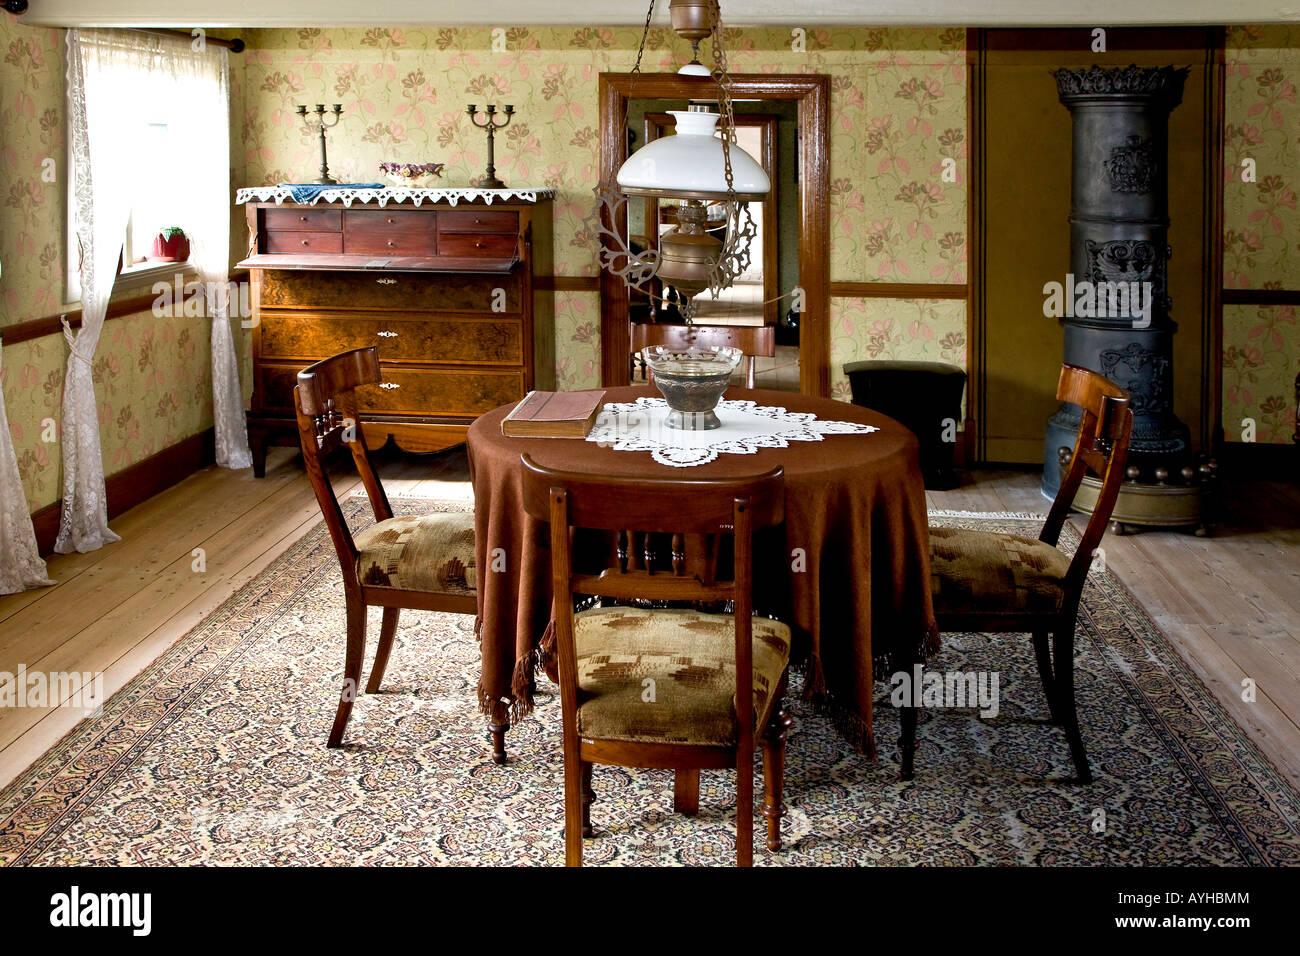 Old sitting room interior - Stock Image